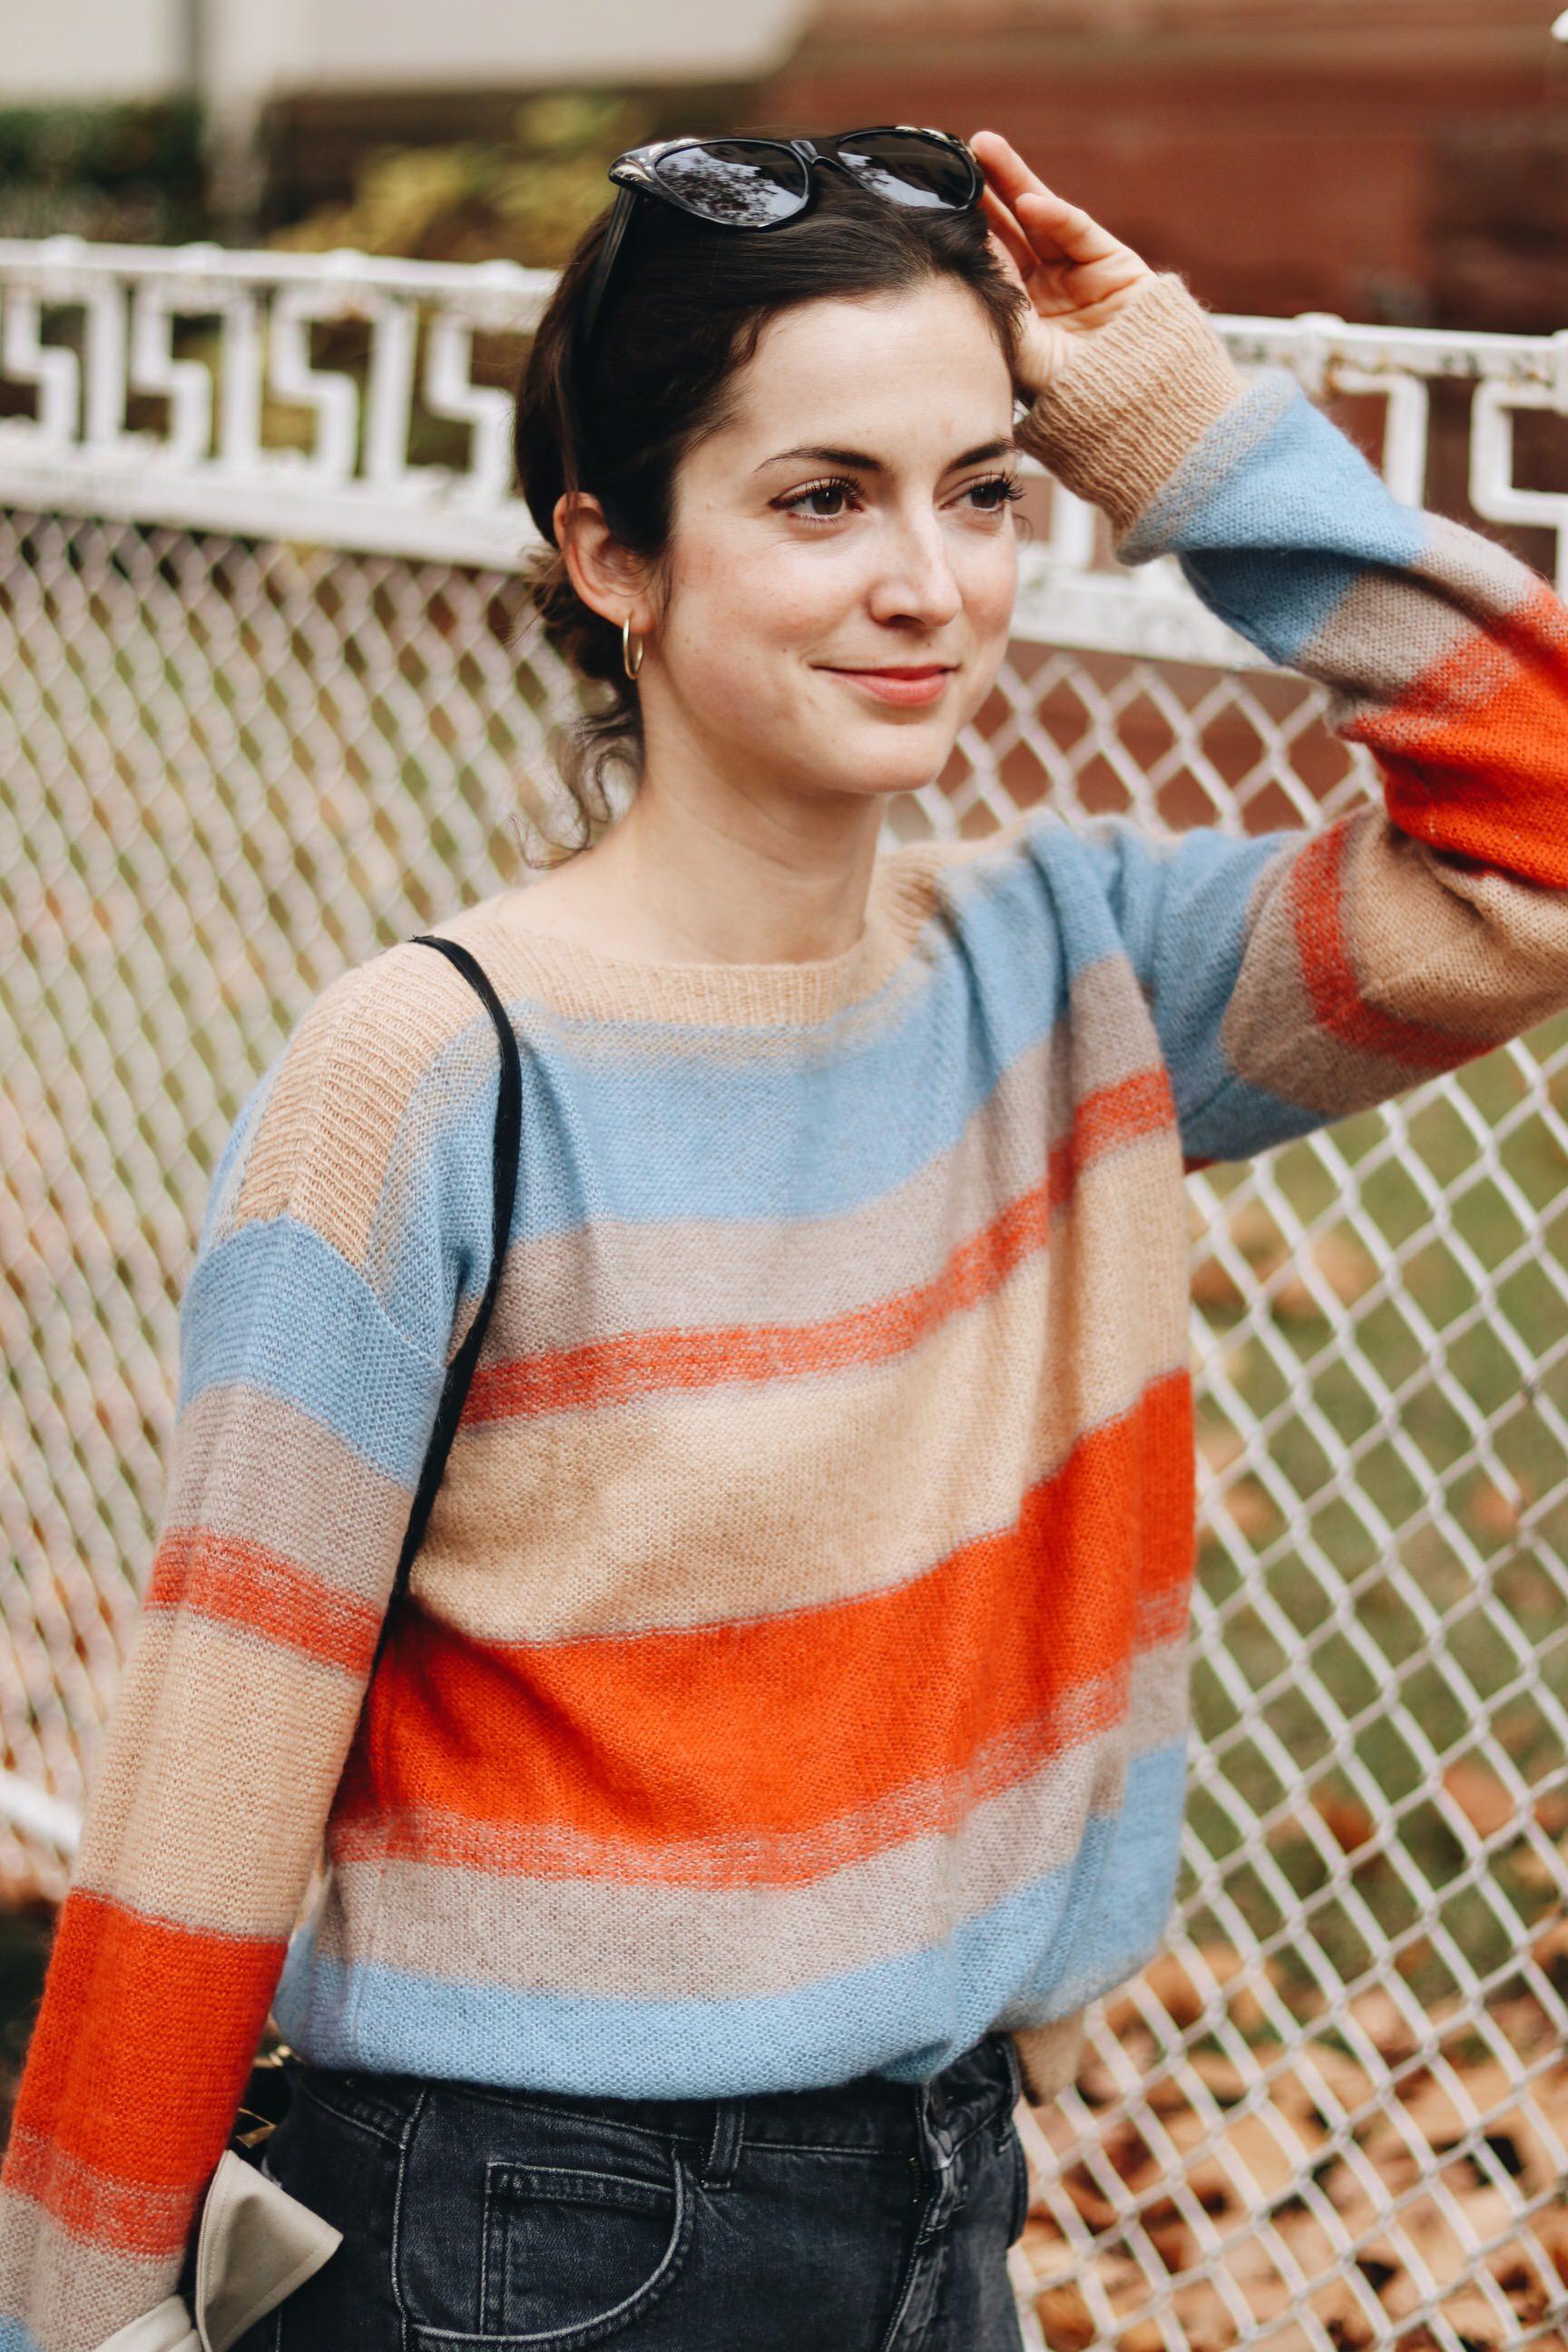 Neele Modebloggerin Modeblog Top 10 Herbst Outfit